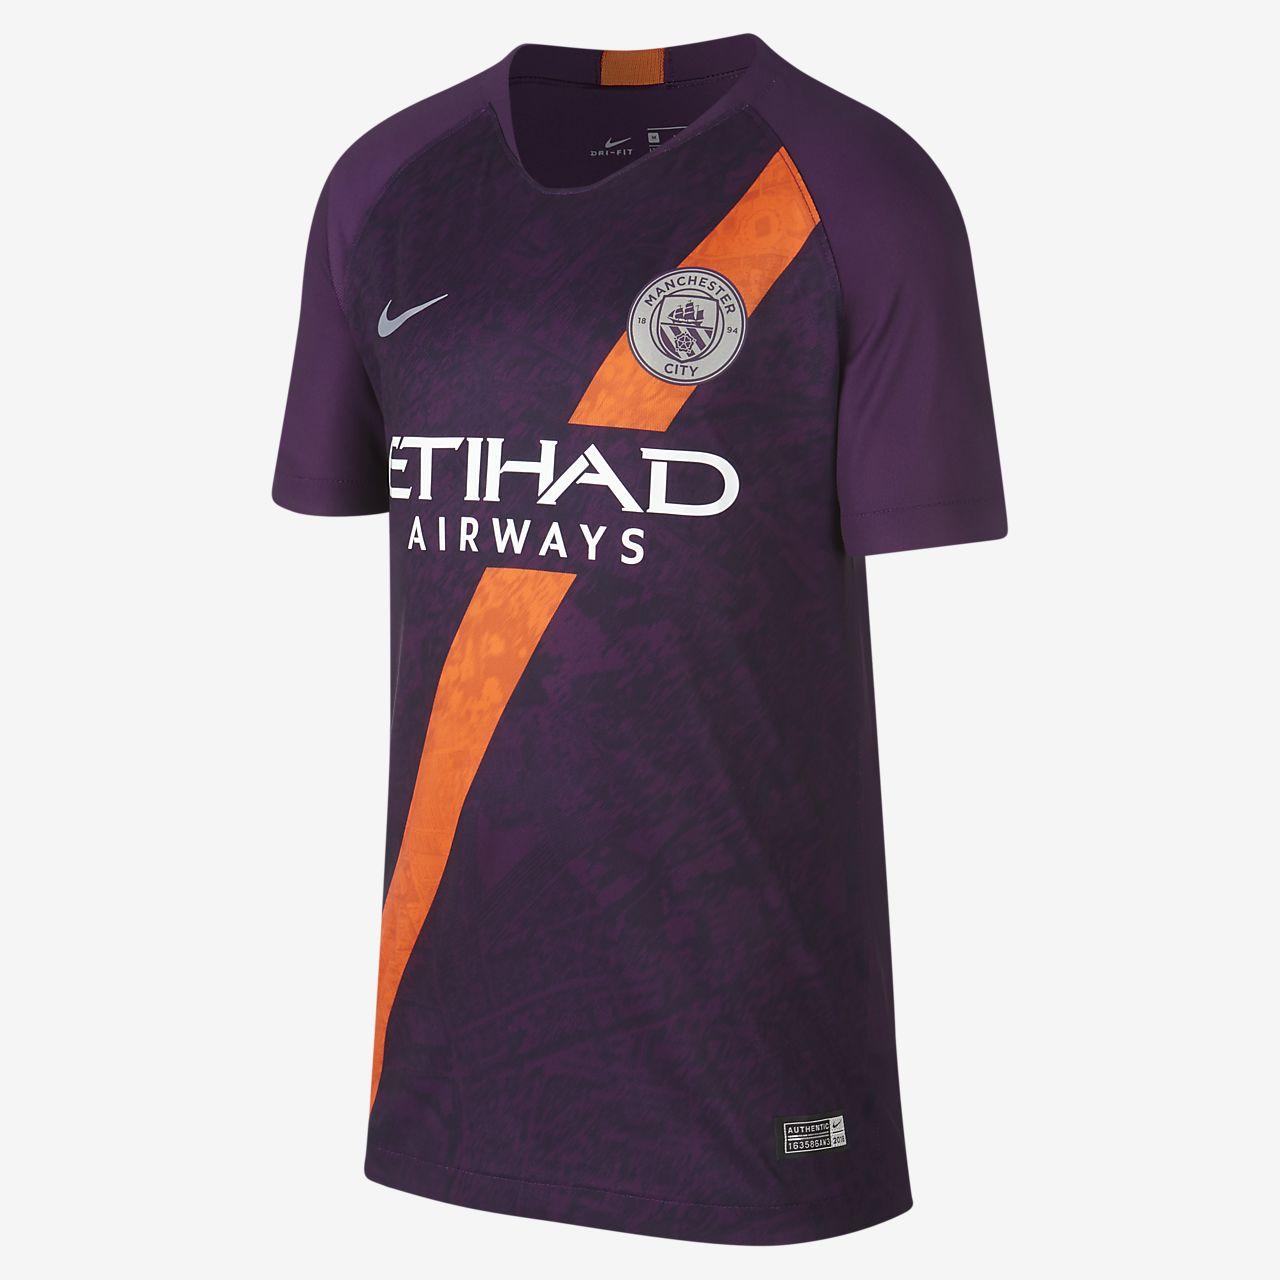 Camiseta de fútbol para niños talla grande alternativa Stadium del Manchester City FC 2018/19